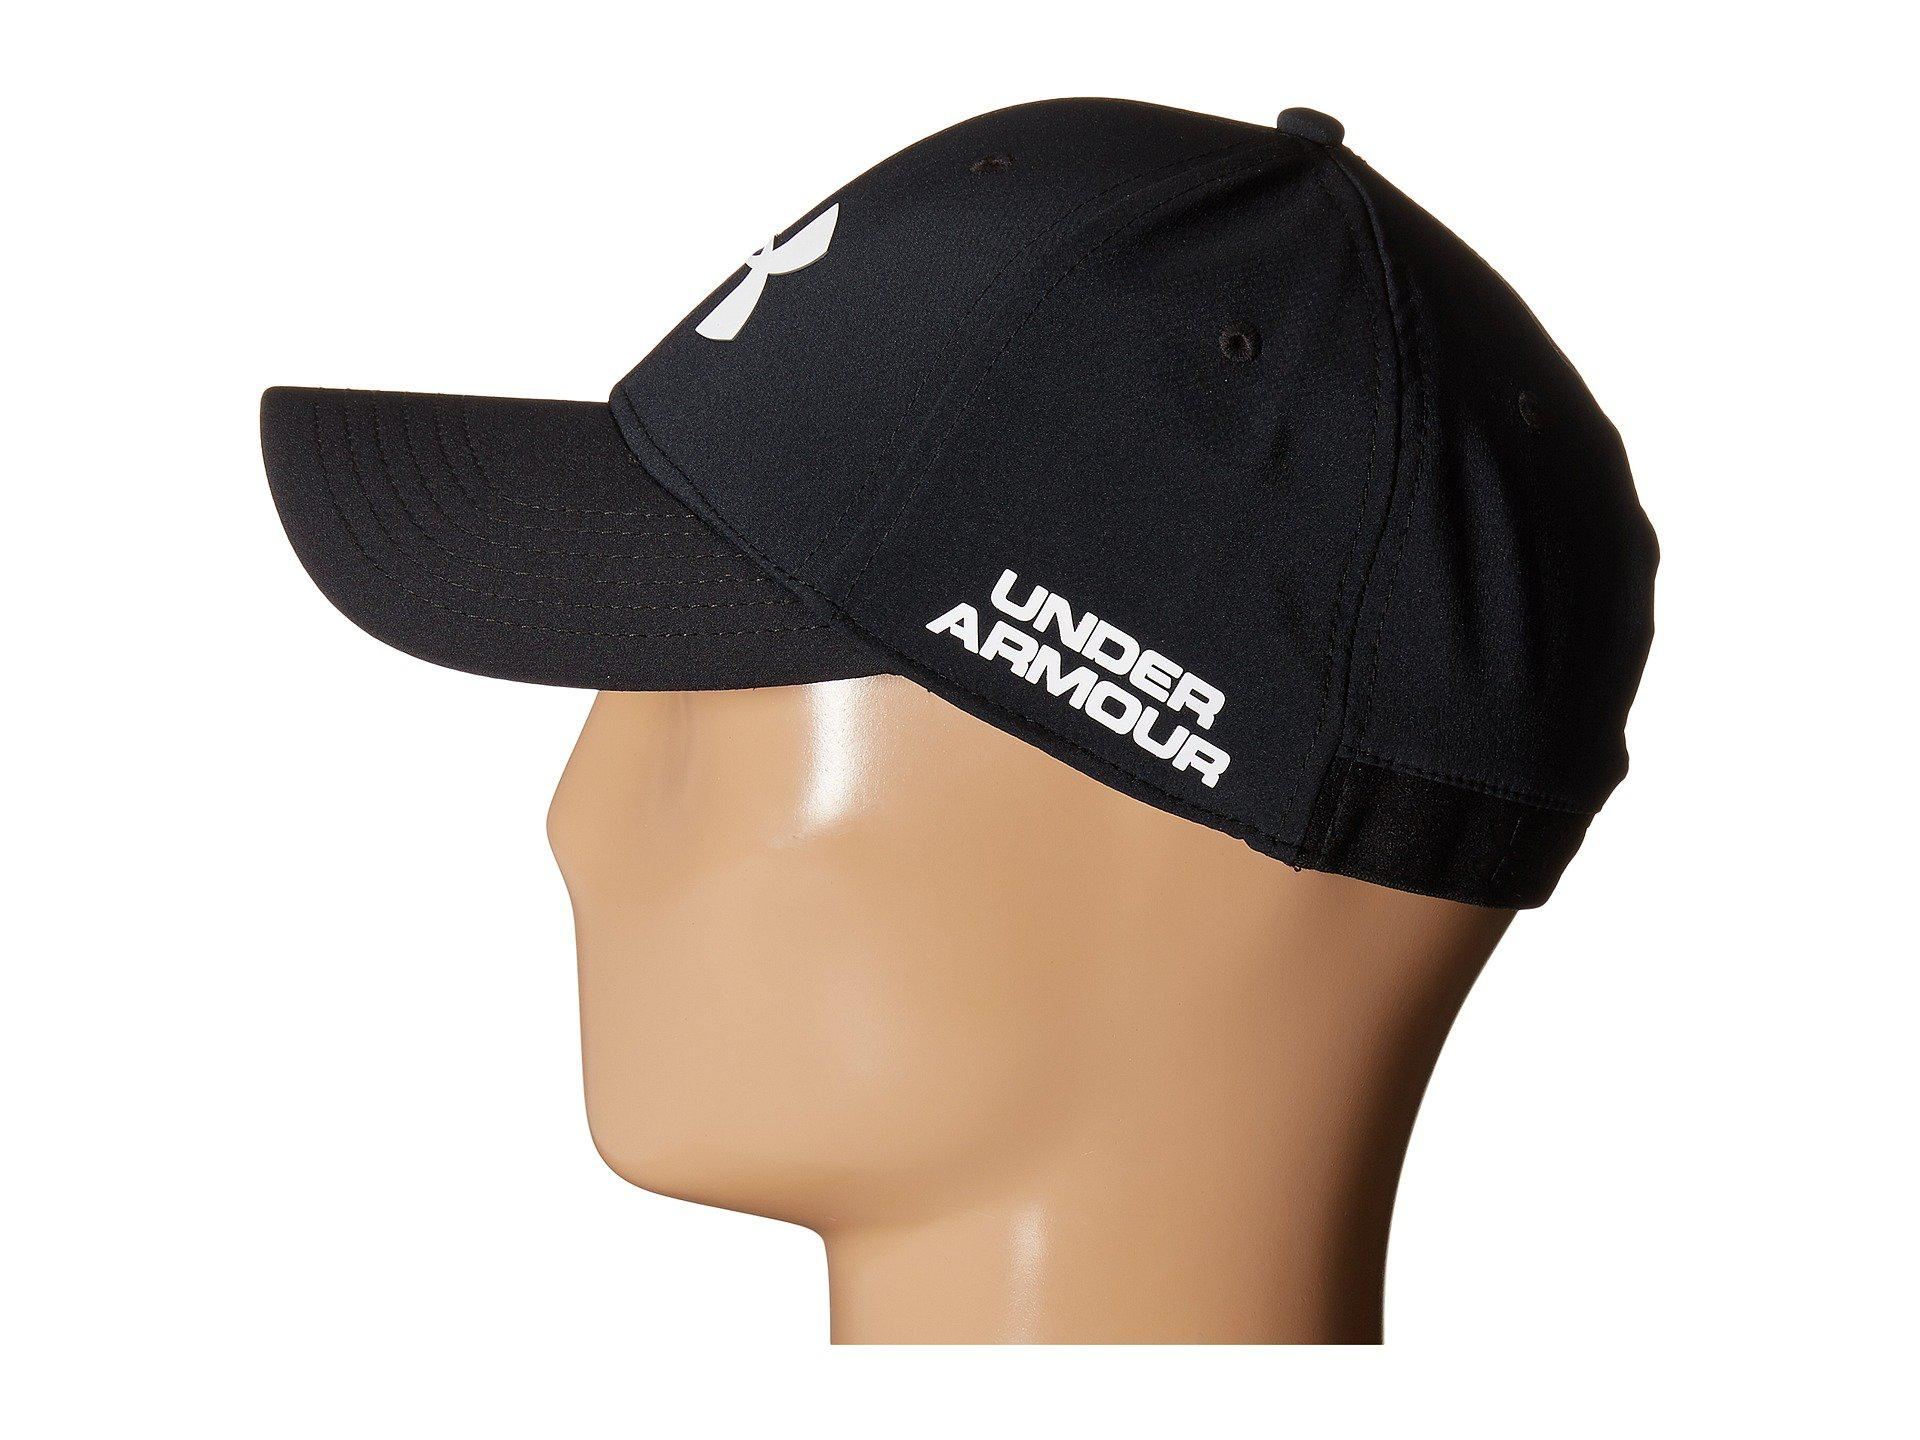 Lyst - Under Armour Ua Golf Headline Cap in Black for Men 89f73b51d72